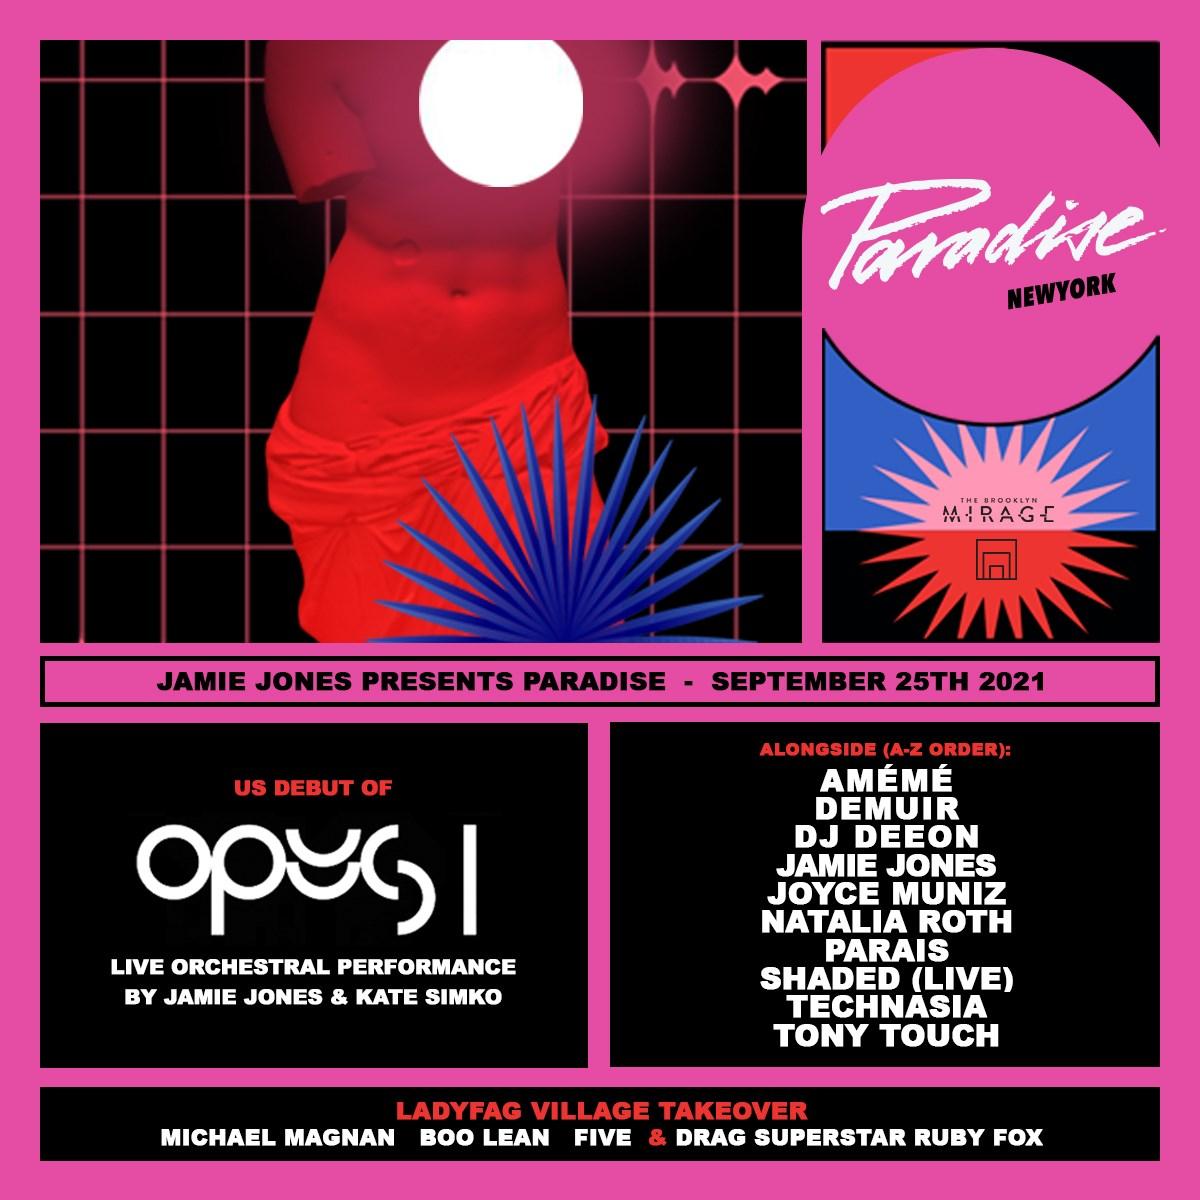 Jamie Jones presents Paradise New York - The Brooklyn Mirage - Flyer front